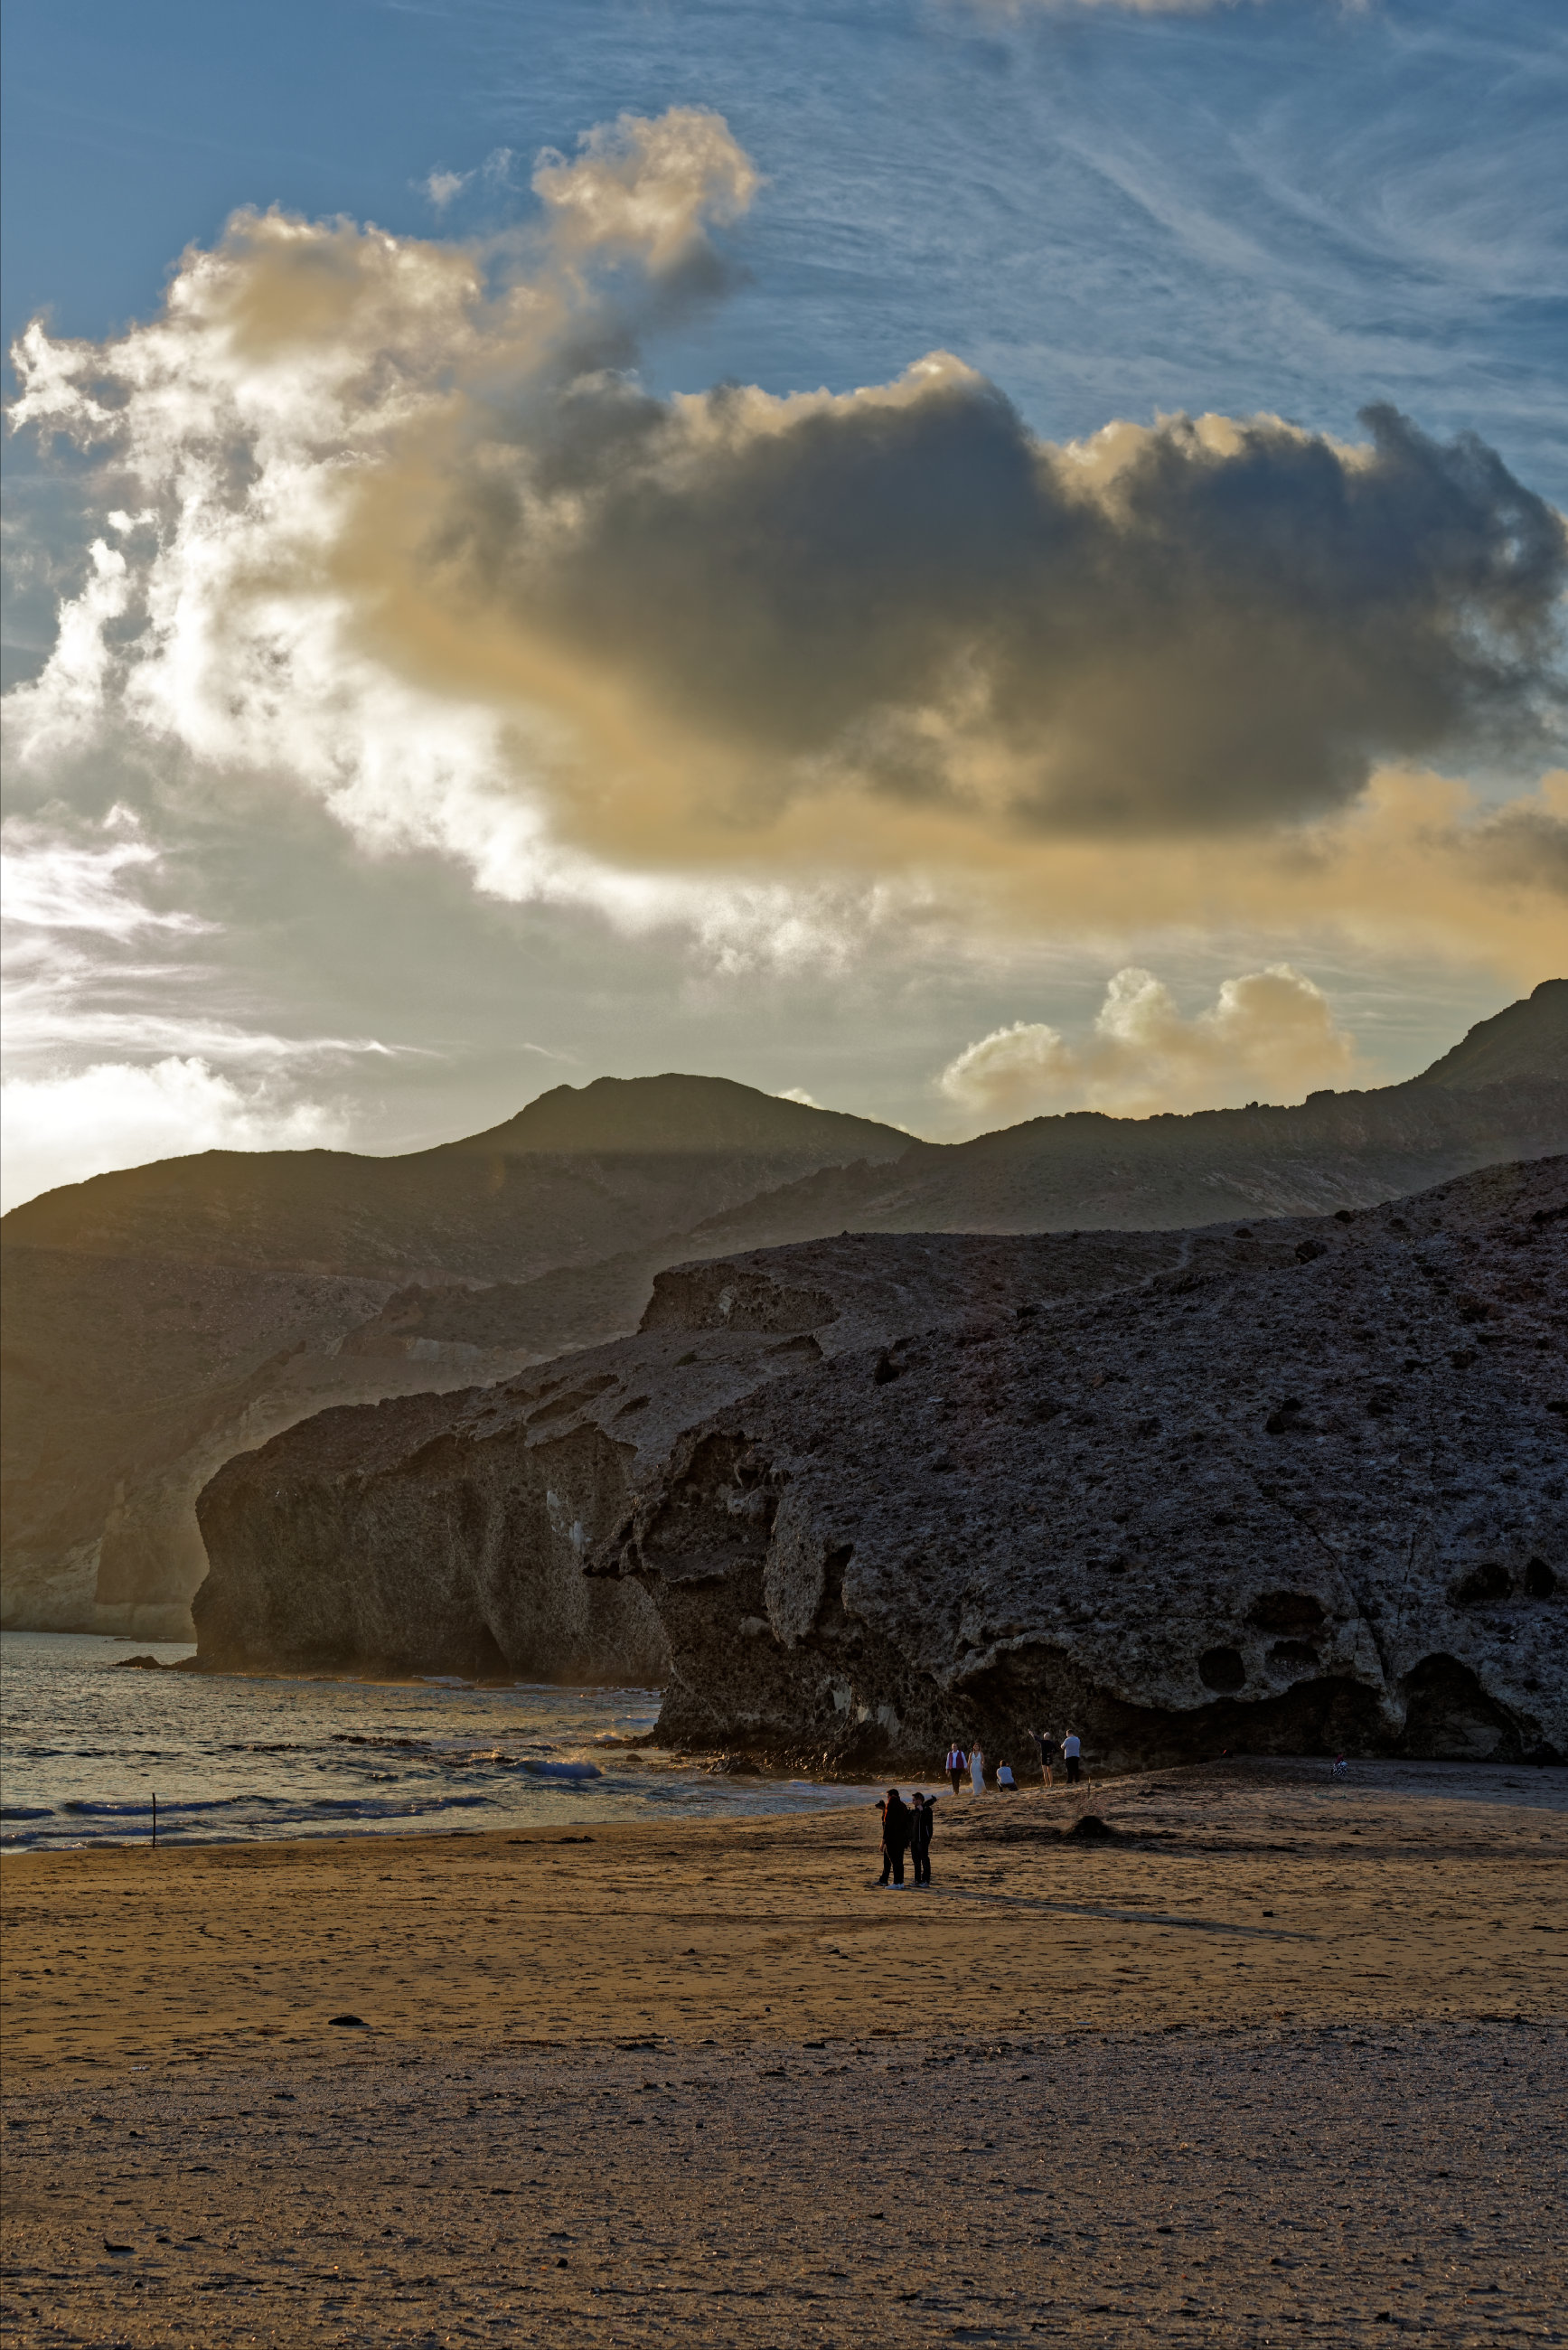 151104-San Jose-Playa de Monsul (45)